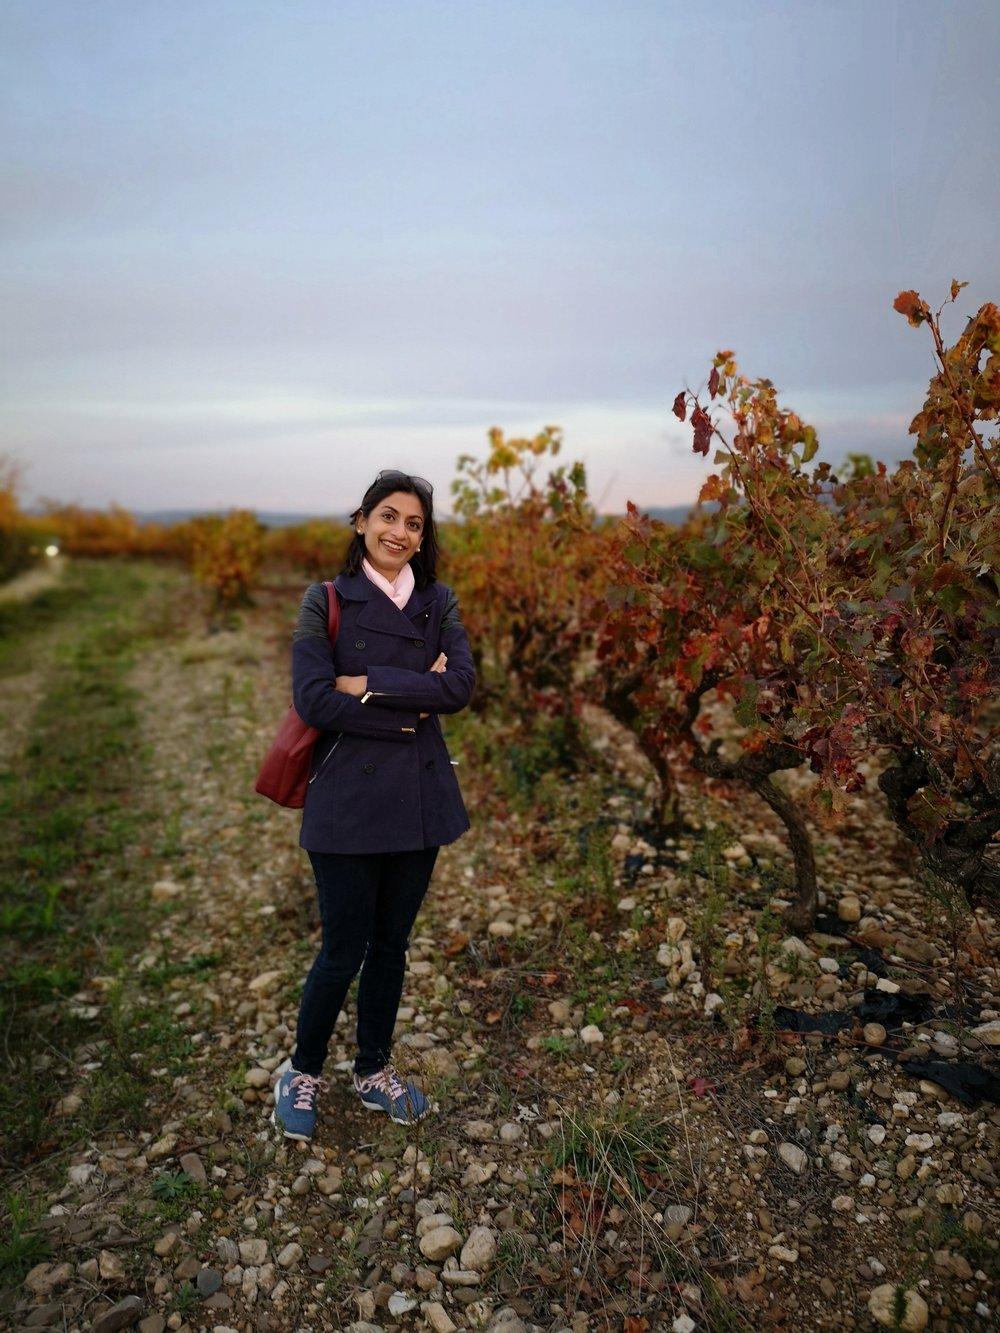 Sumi Sumilier Tasting Wine Journalist